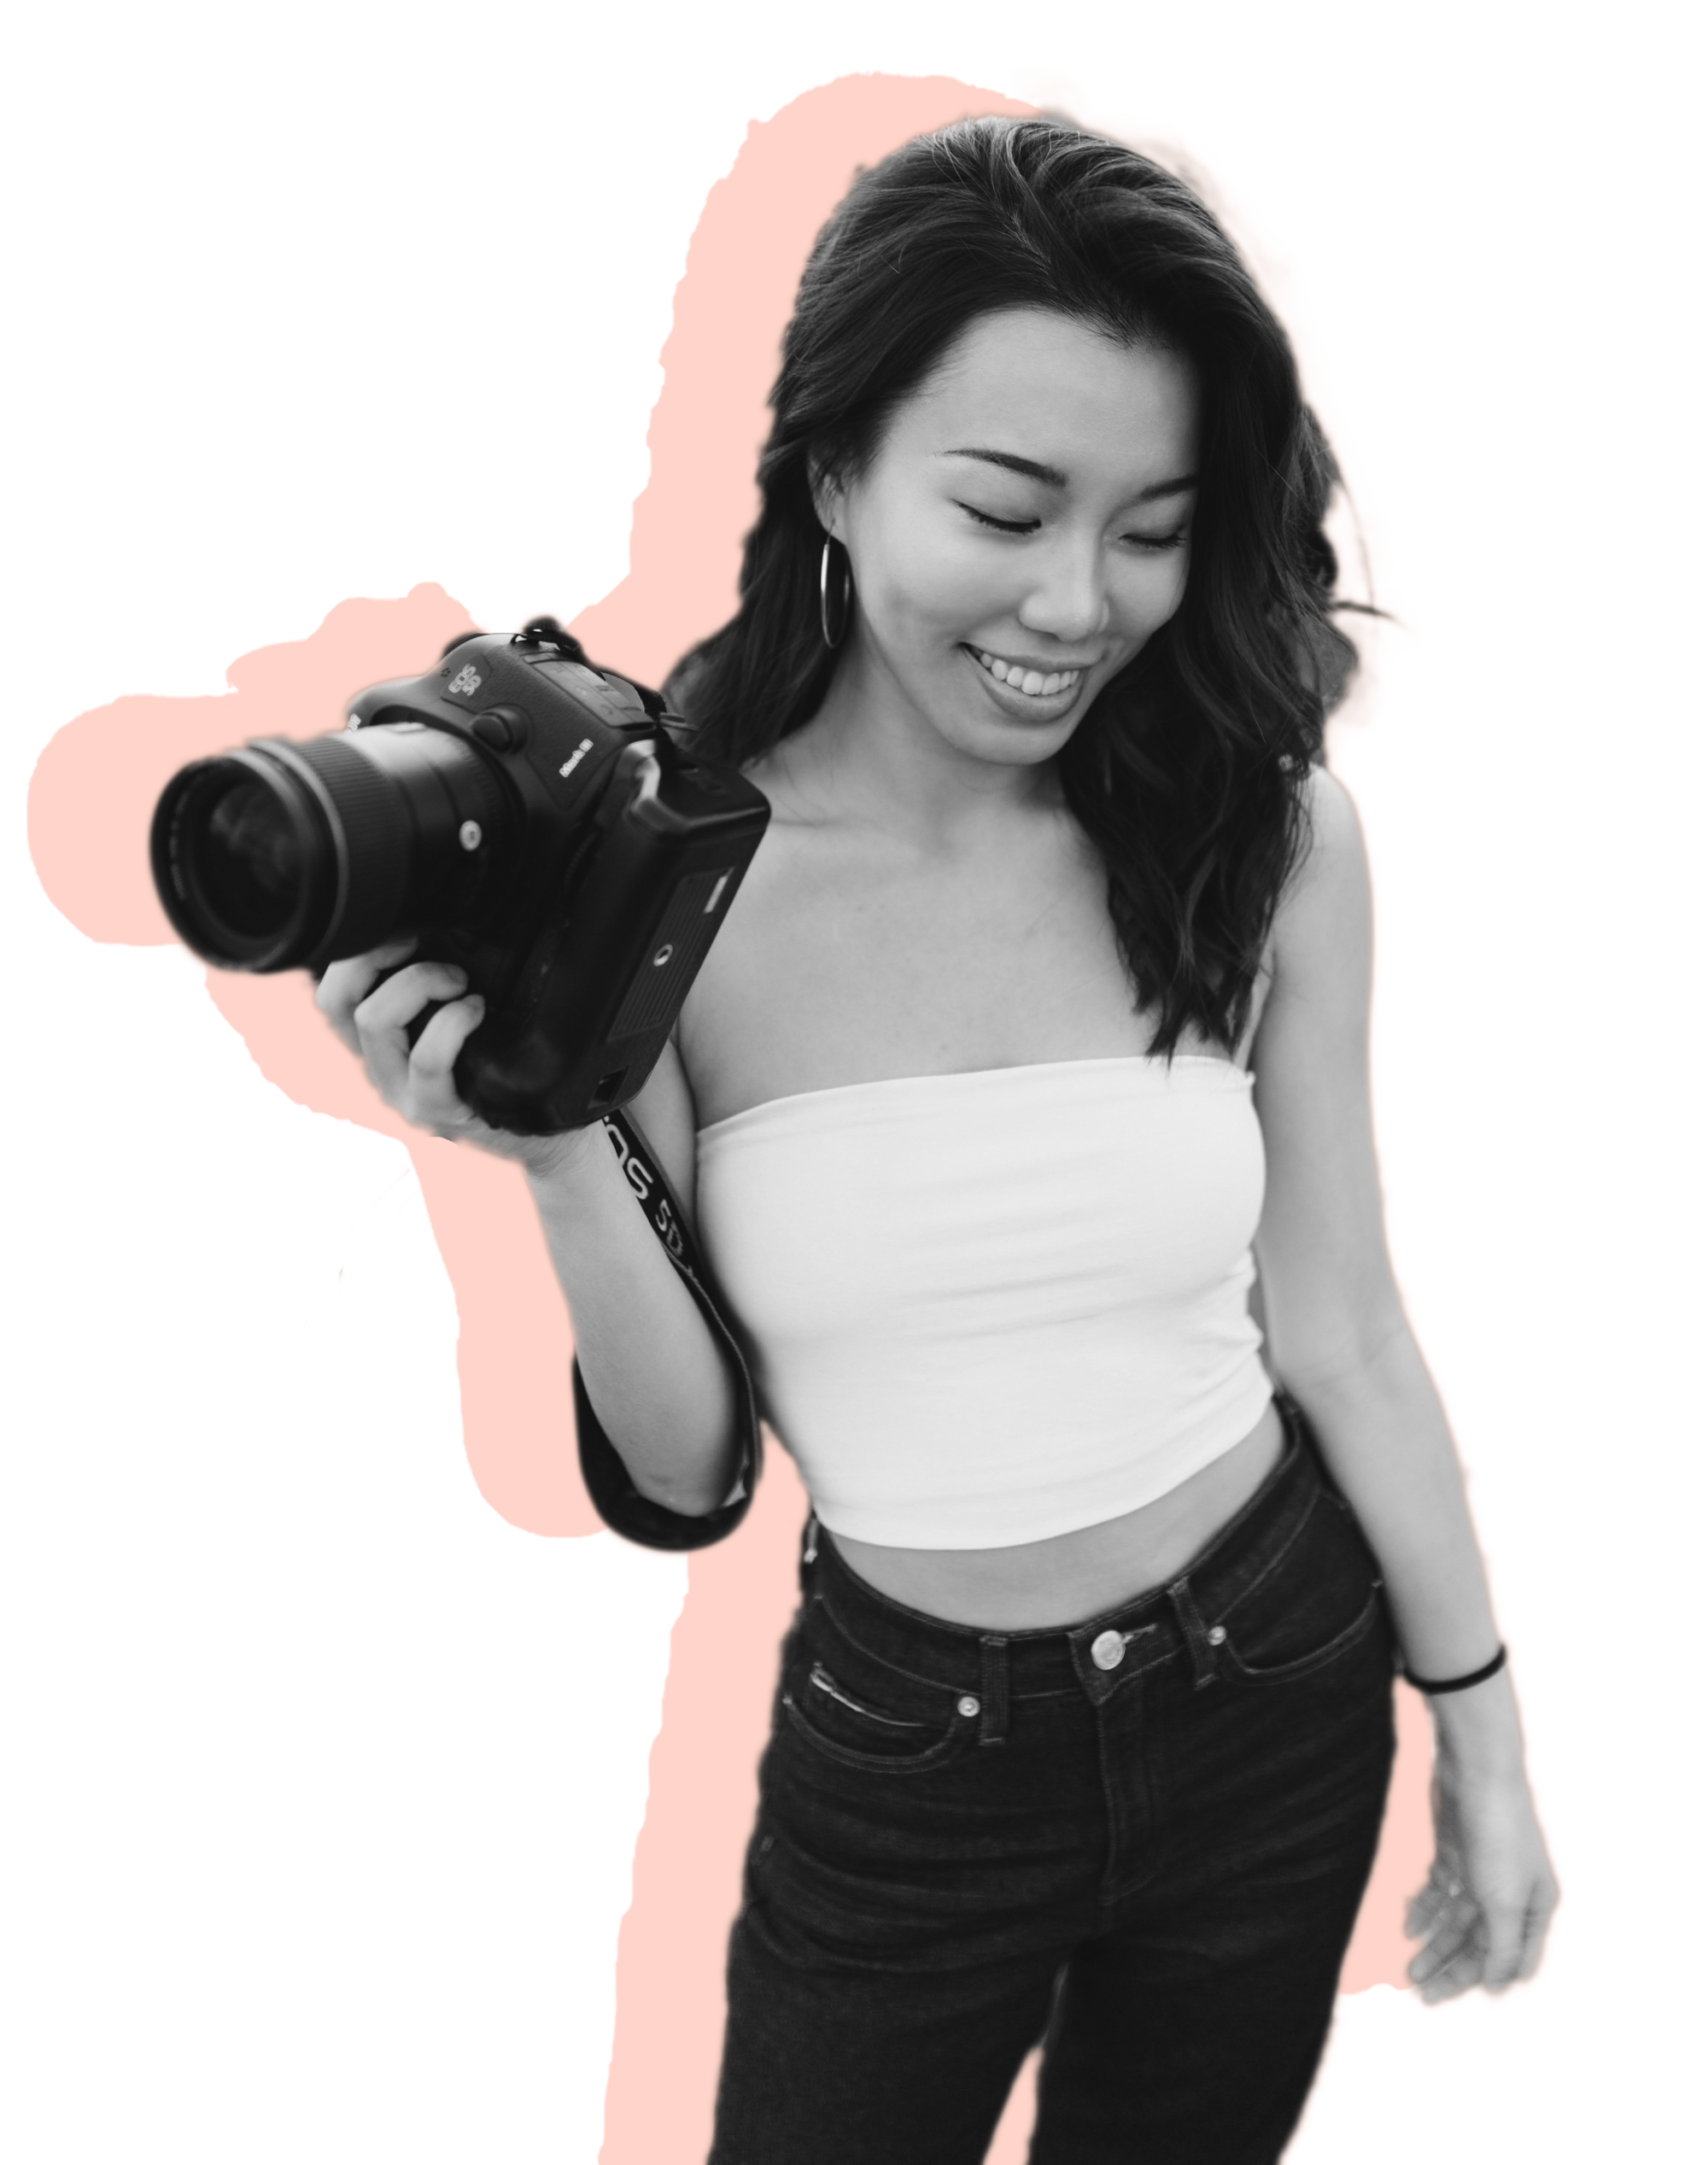 Ann holding a camera